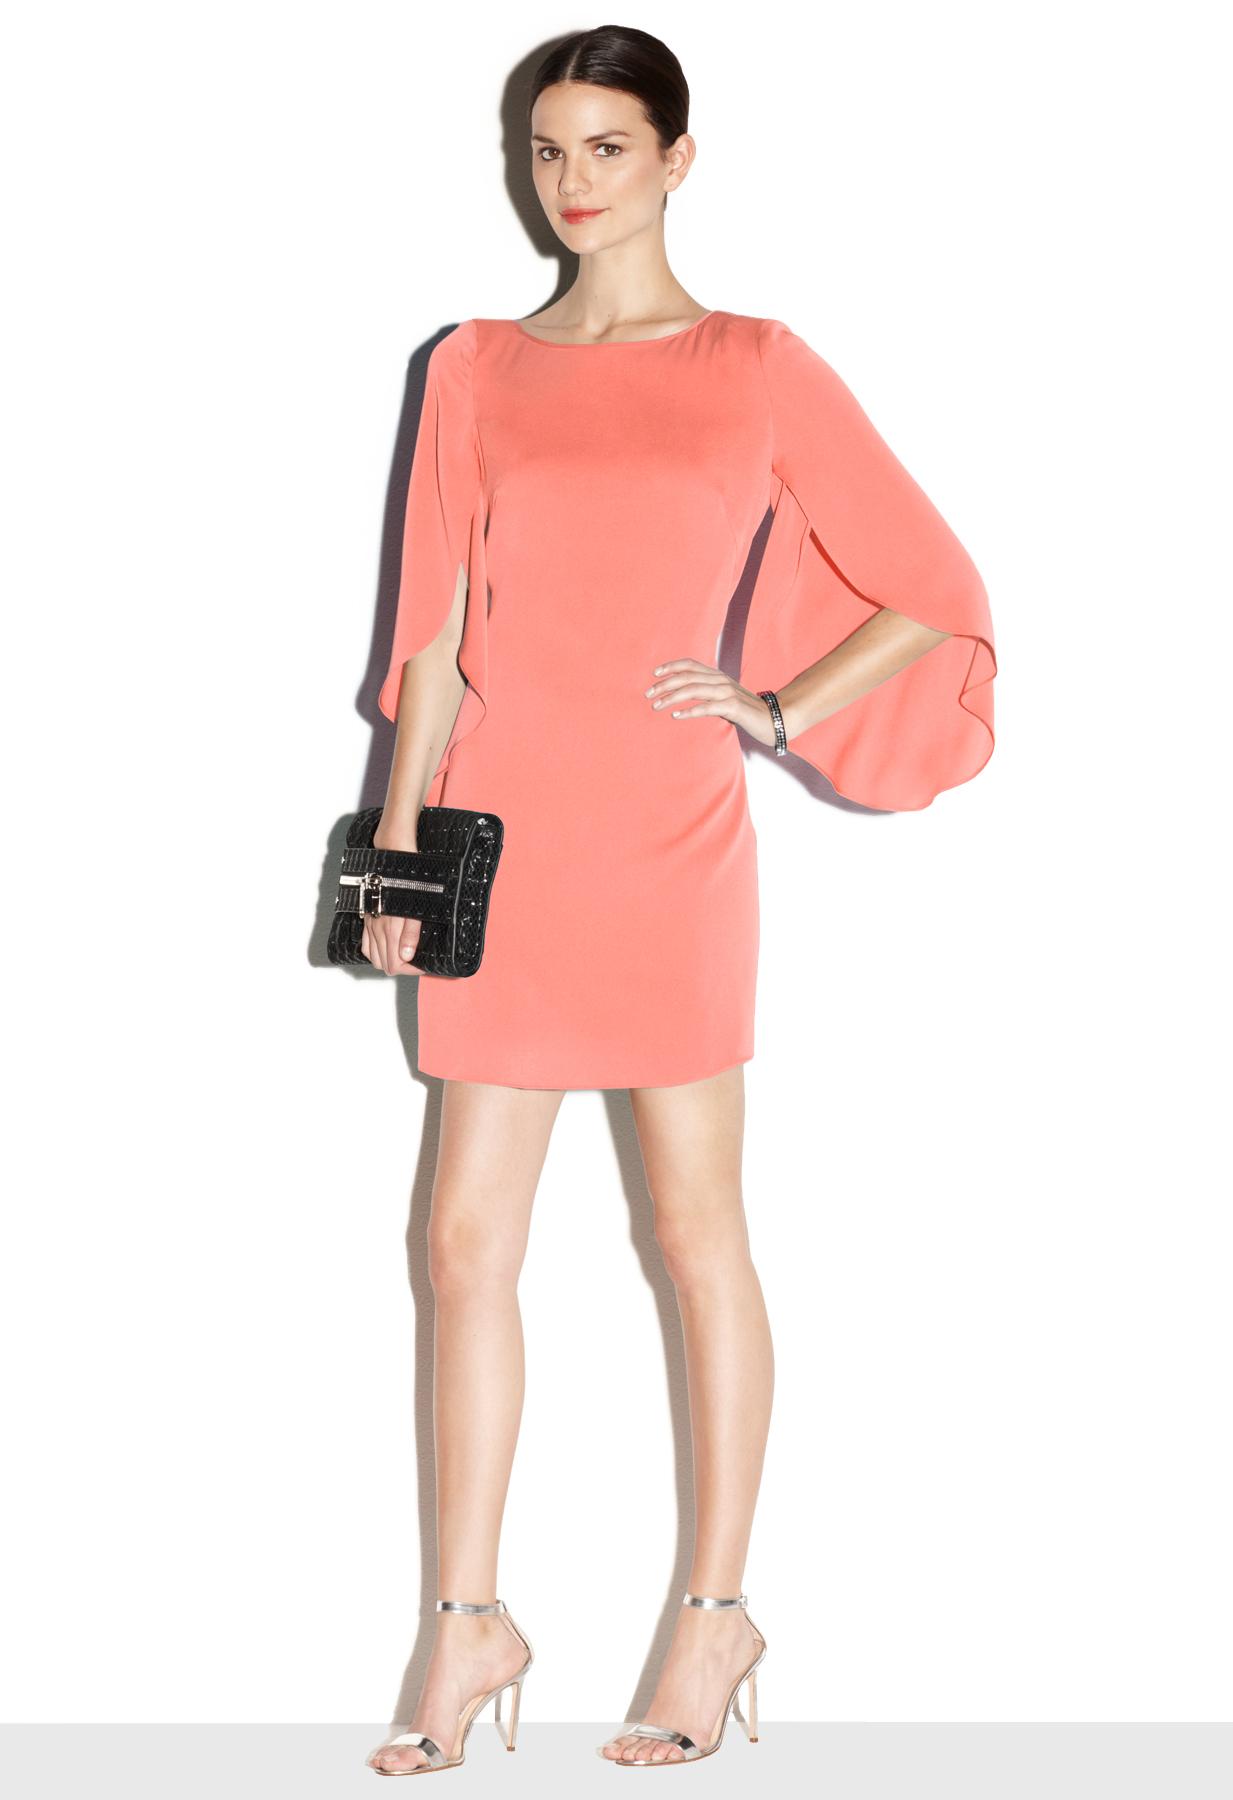 Milly Butterfly Sleeve Dress in Pink | Lyst